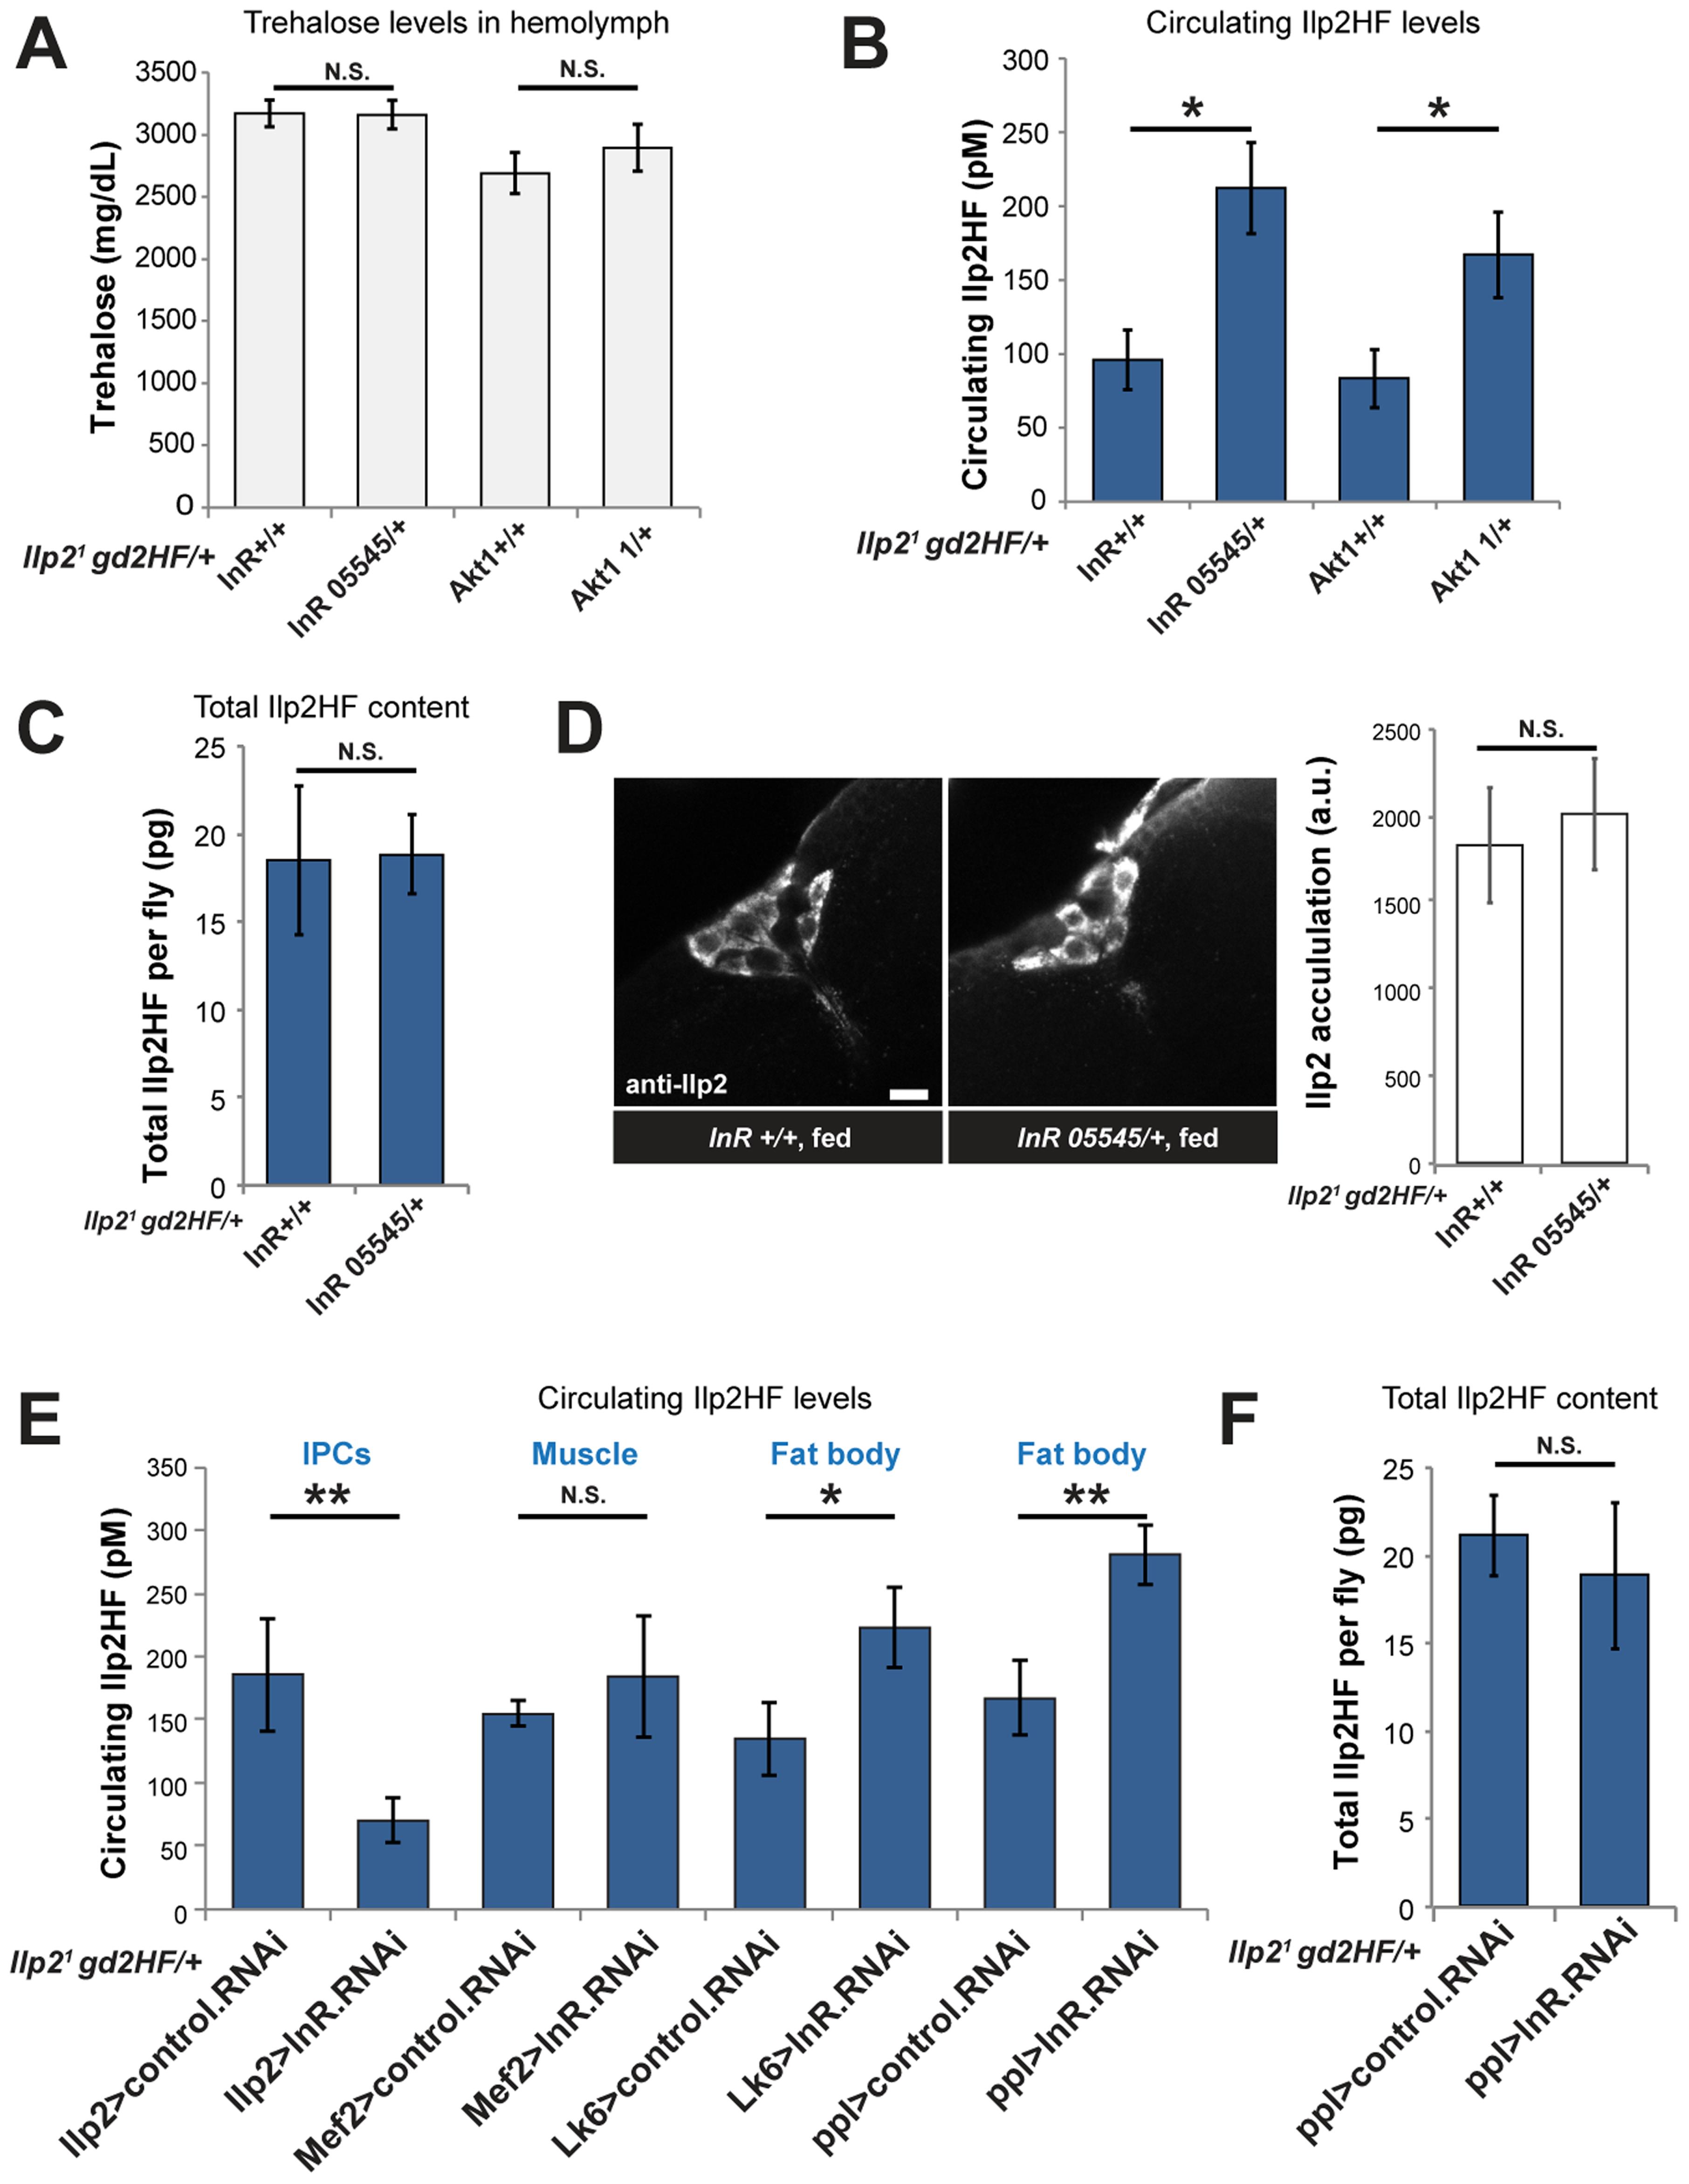 Enhanced insulin secretion from impaired peripheral insulin signaling in <i>Drosophila</i>.